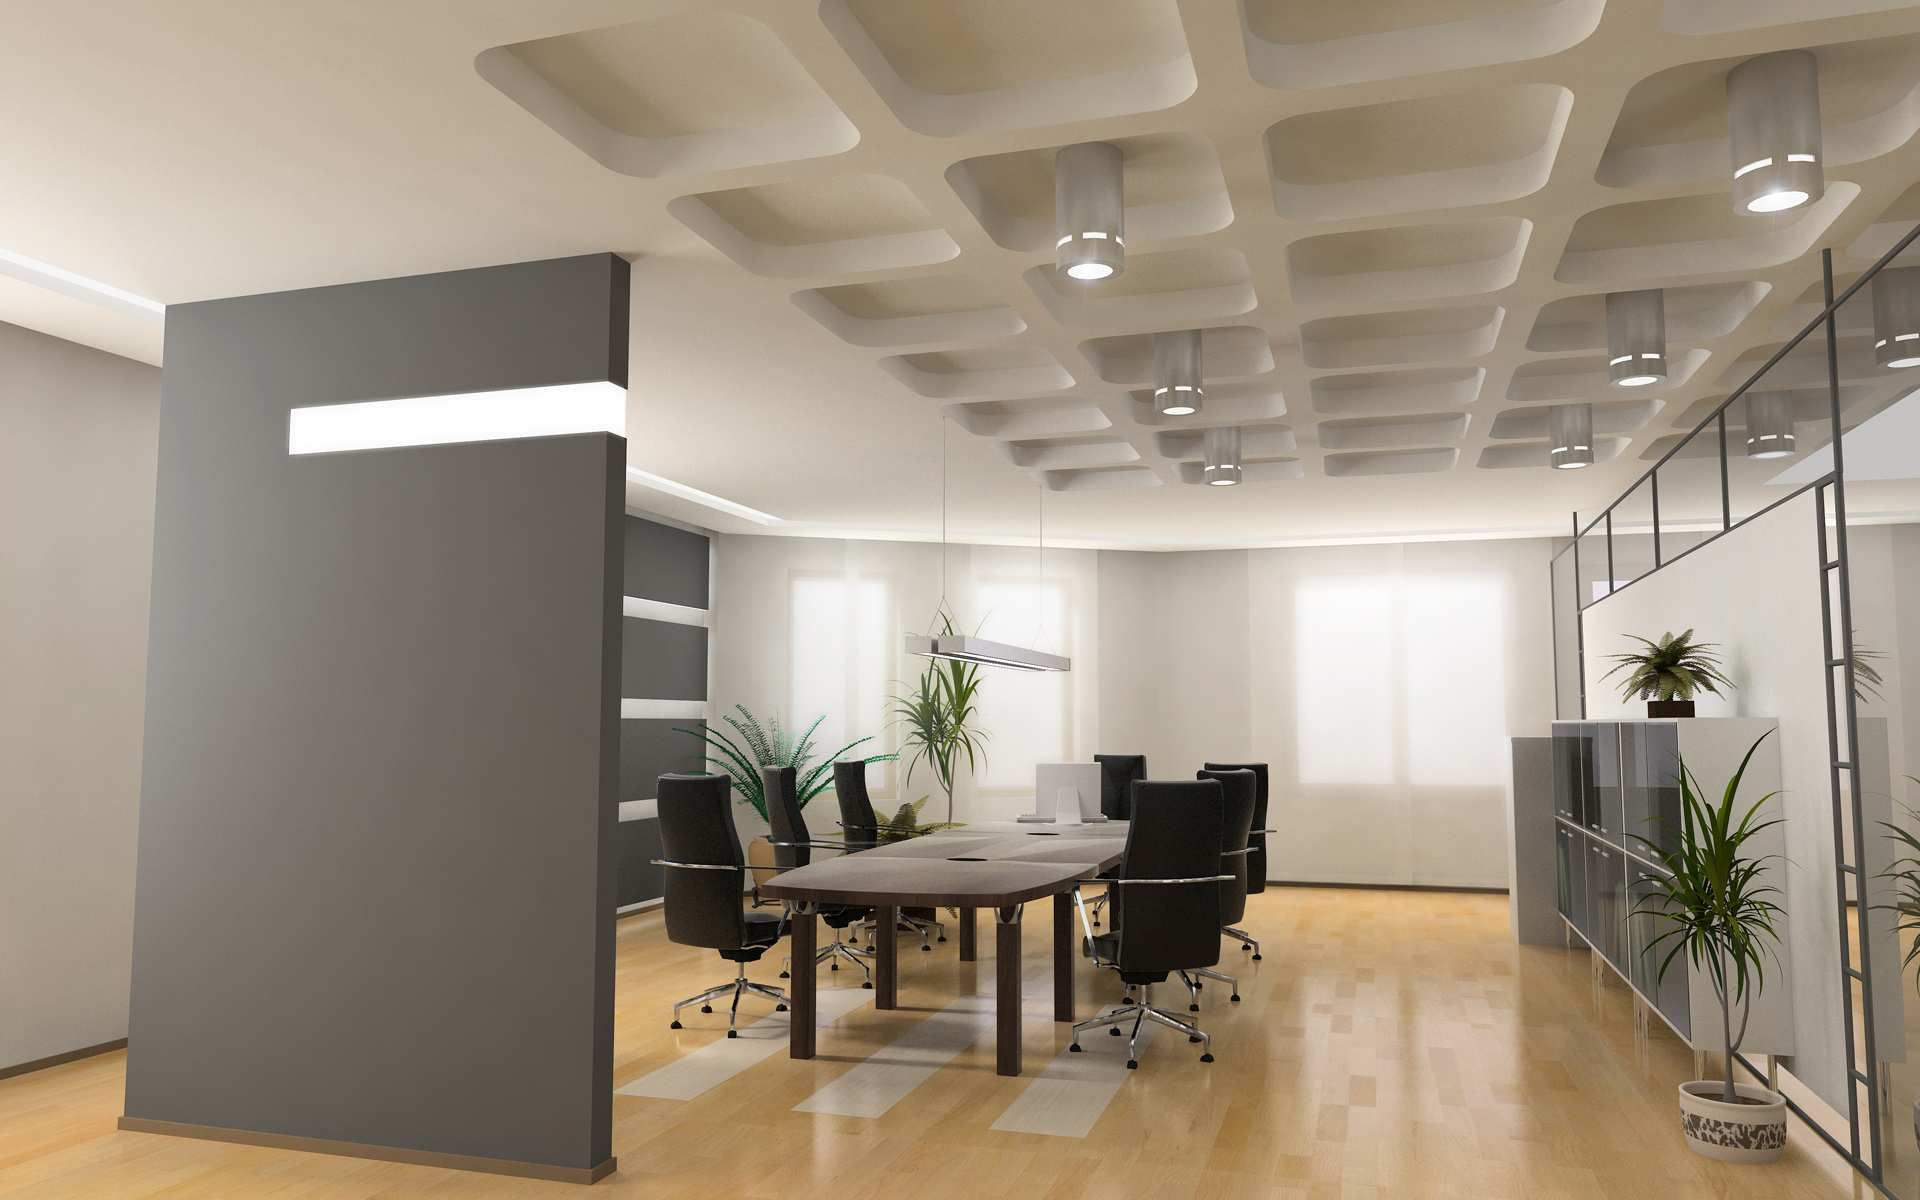 Pleasant 17 Best Images About Office Design 2015 On Pinterest Home Office Largest Home Design Picture Inspirations Pitcheantrous